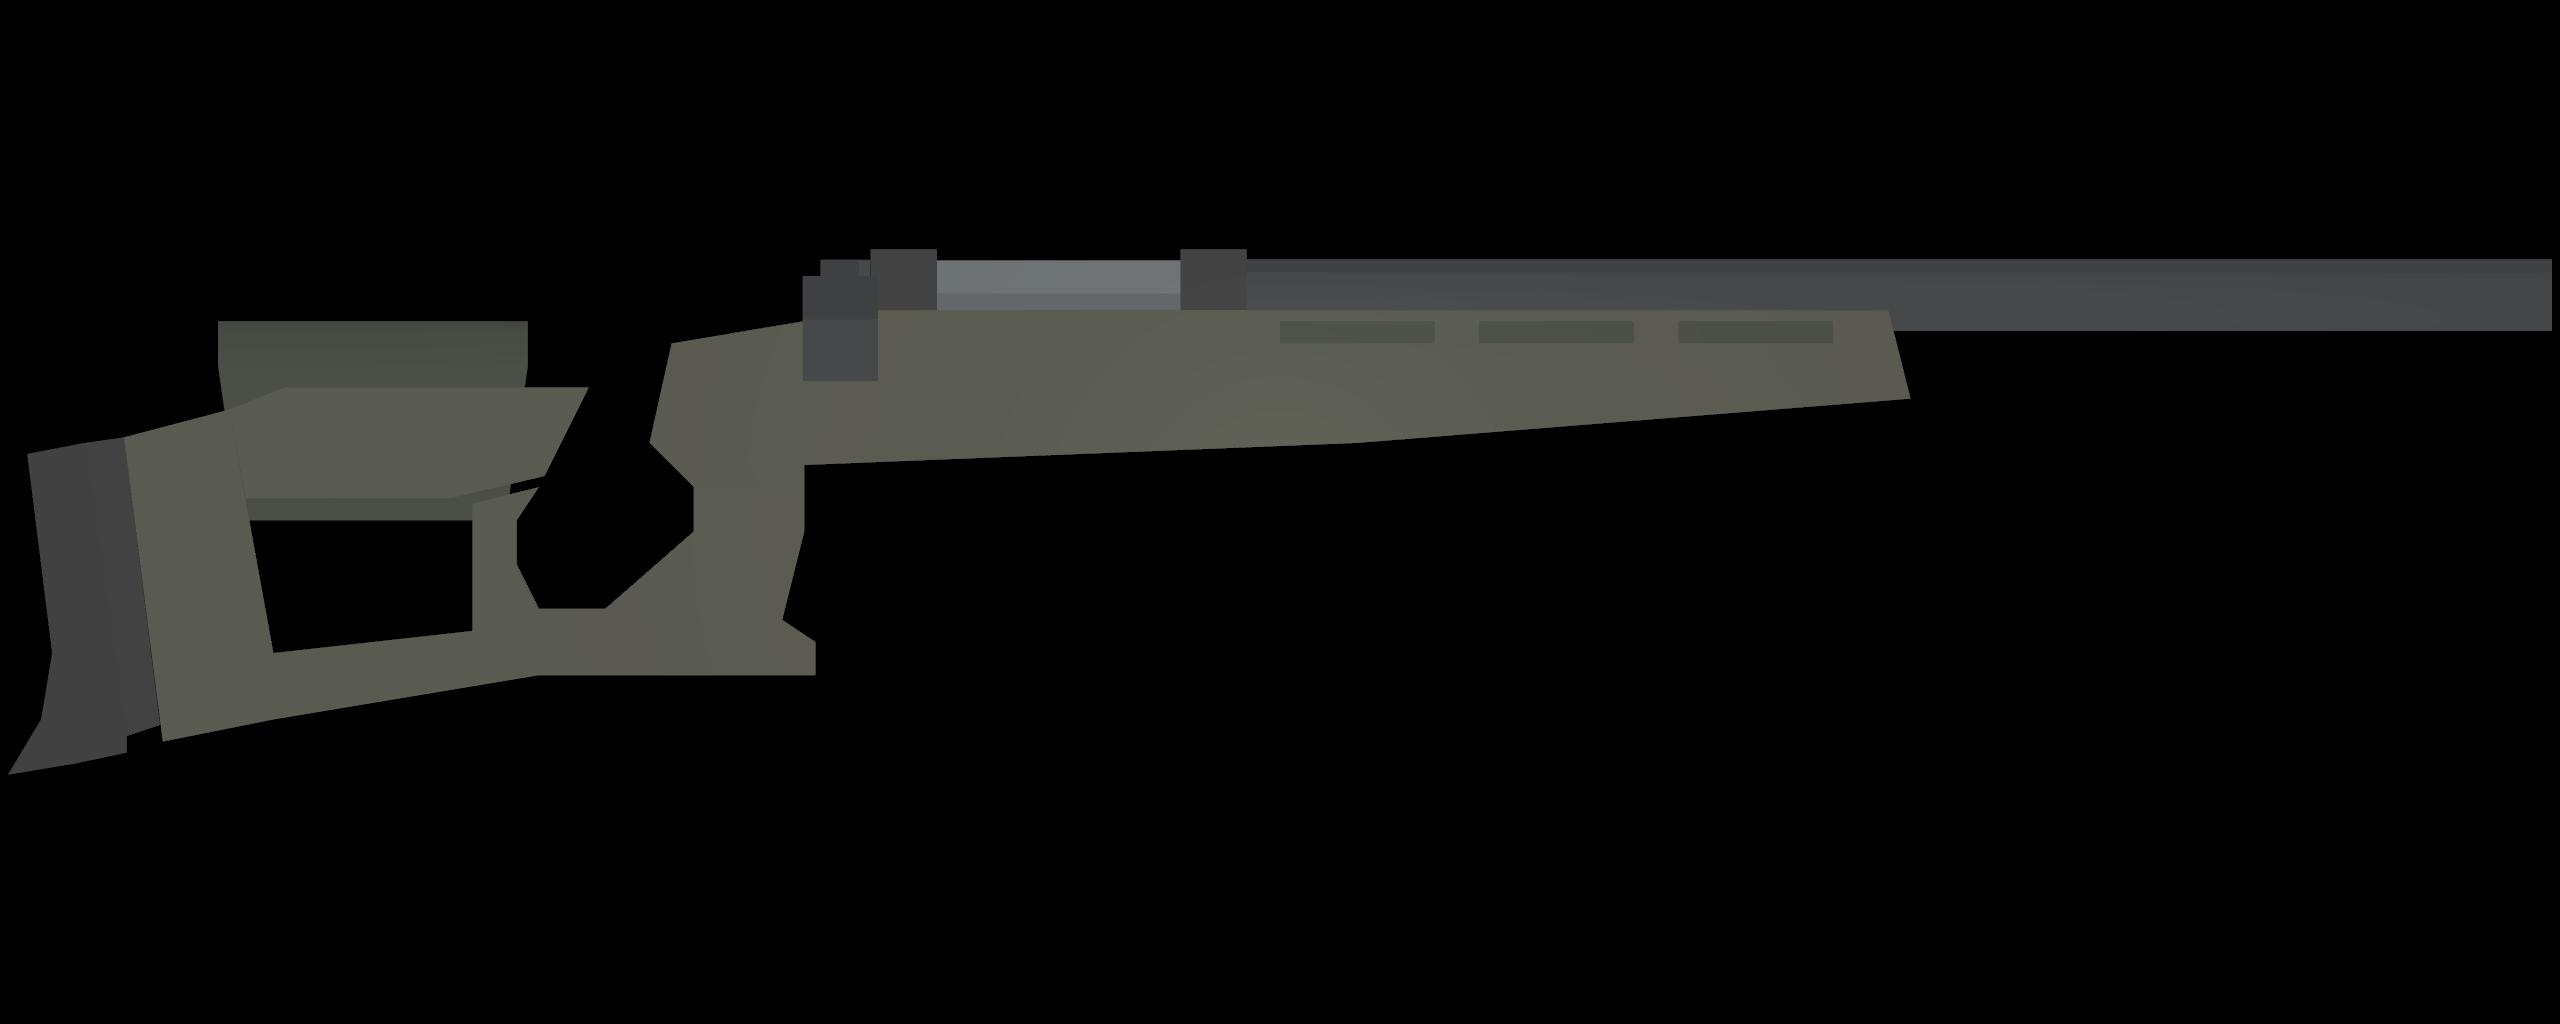 Unturned Uncreated Warfare Mods & All ID List + Attachments - Neutral Weapons - D137DA7